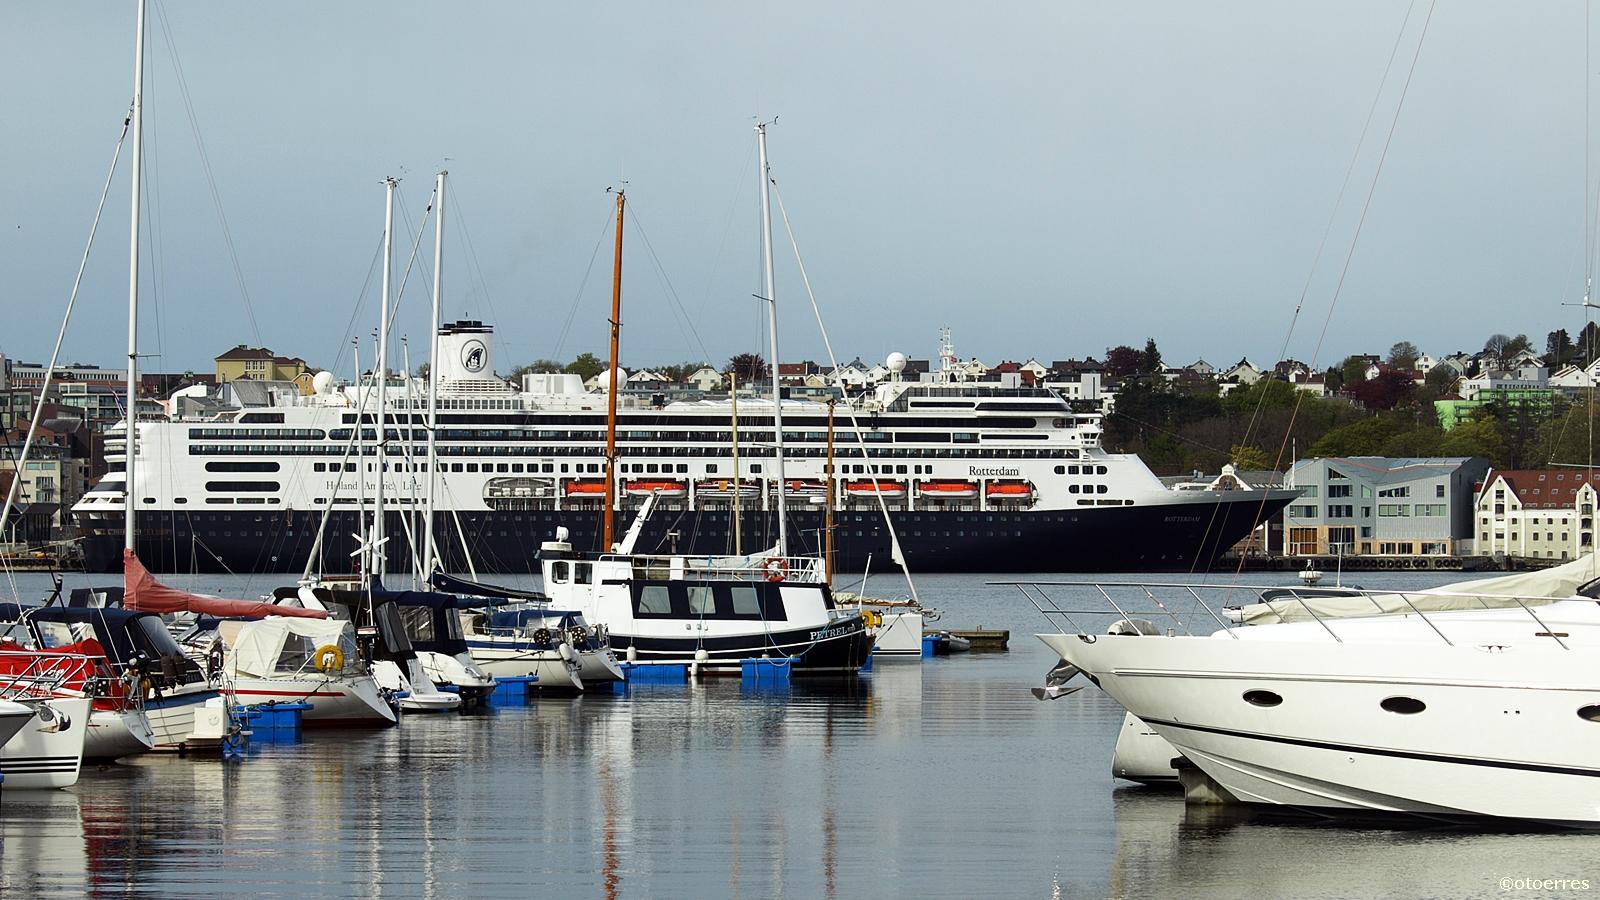 MS Borealis - Fred.Olsen Cruise Line - MS Rotterdam - Cruise - Holland America Line